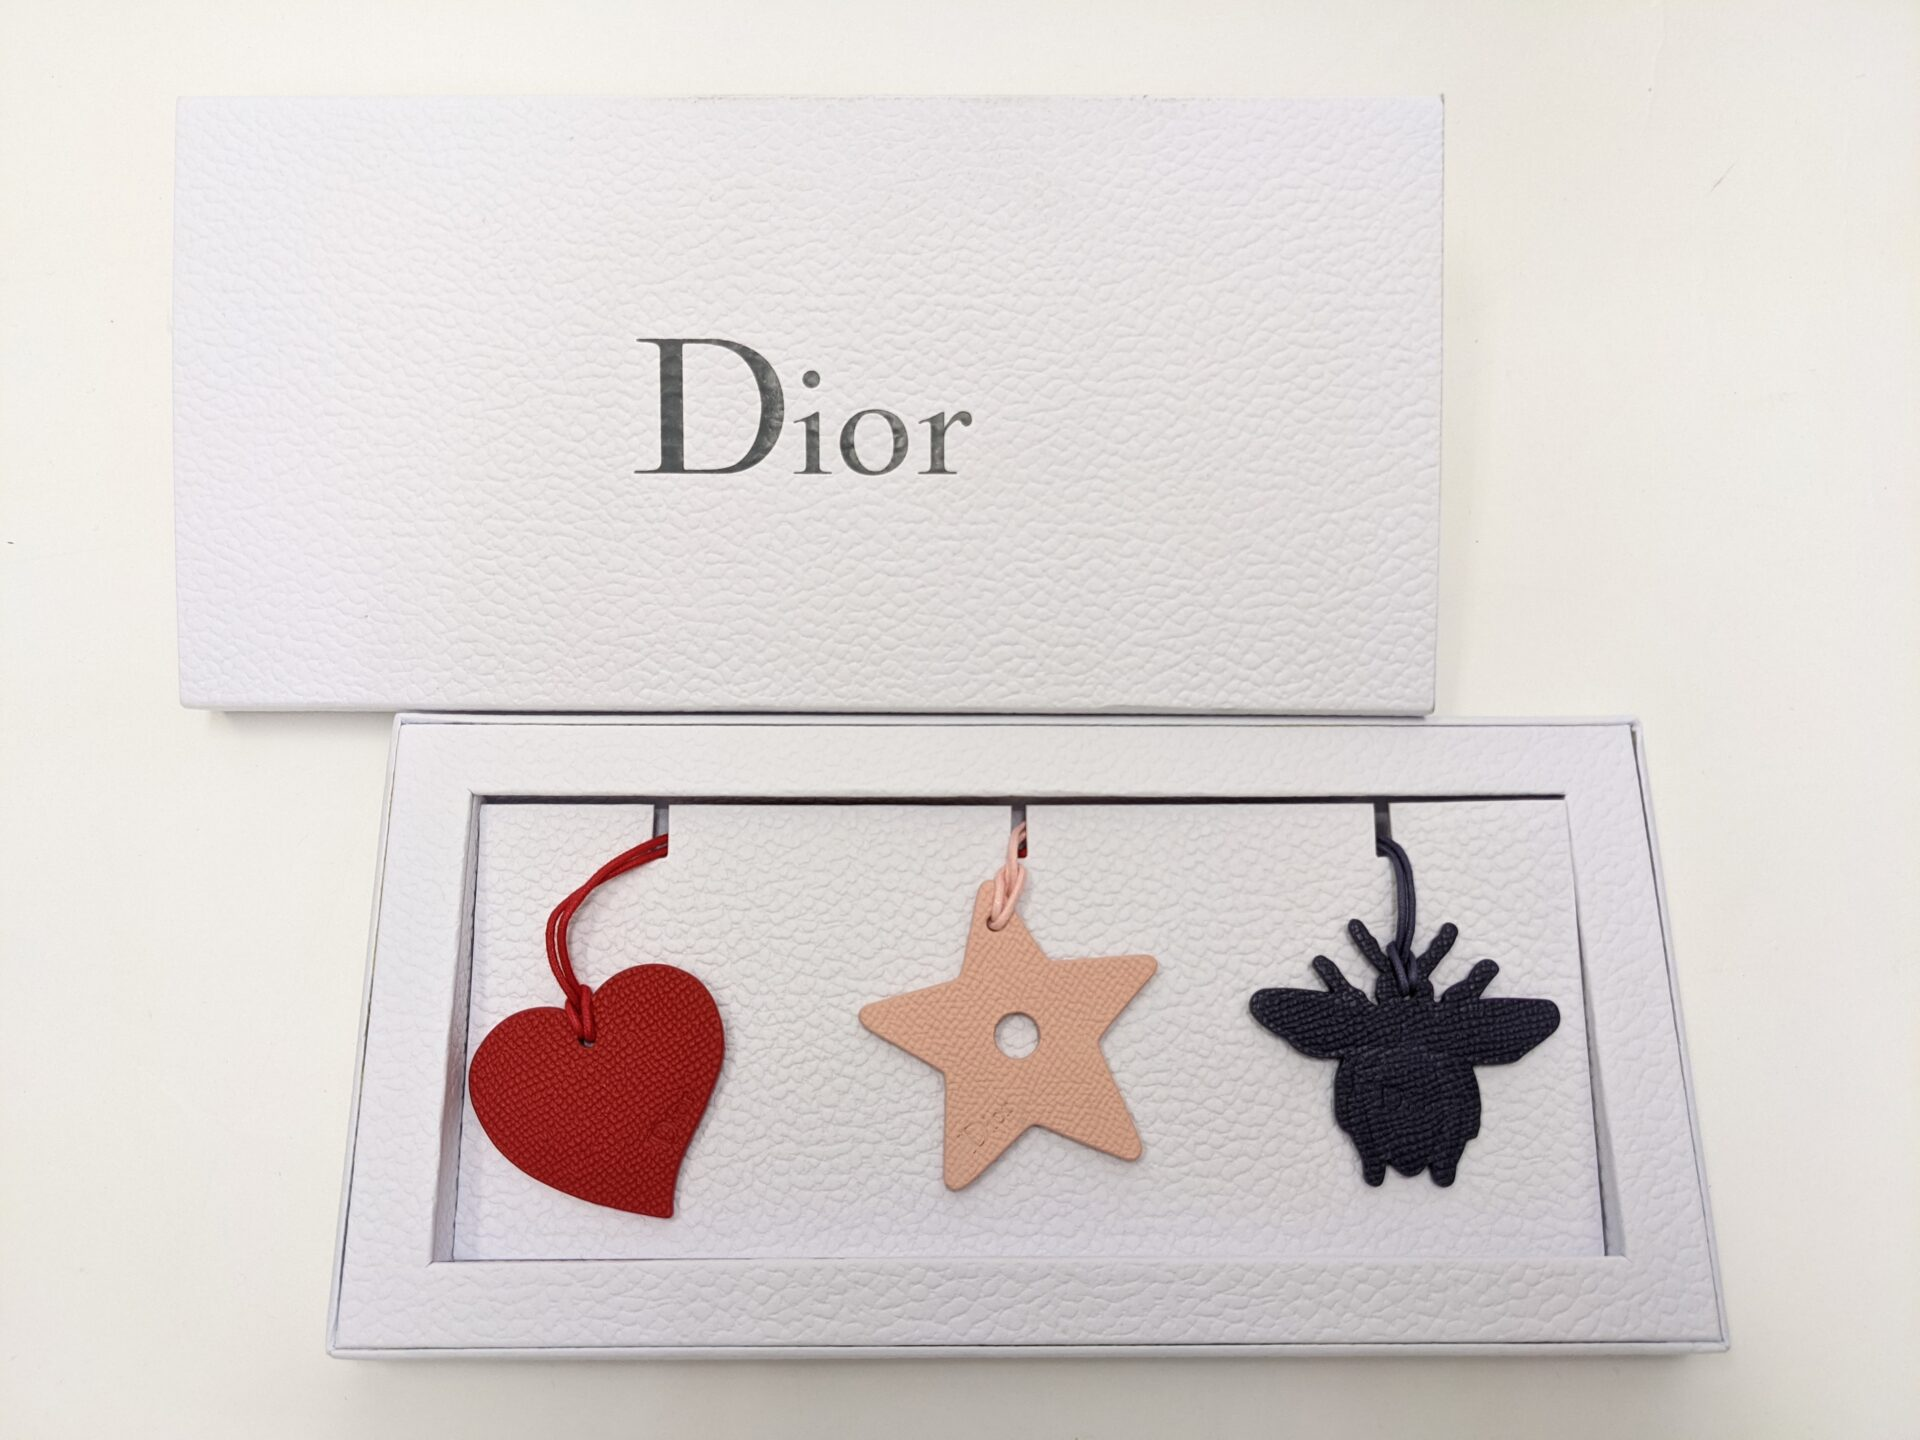 DiorDior